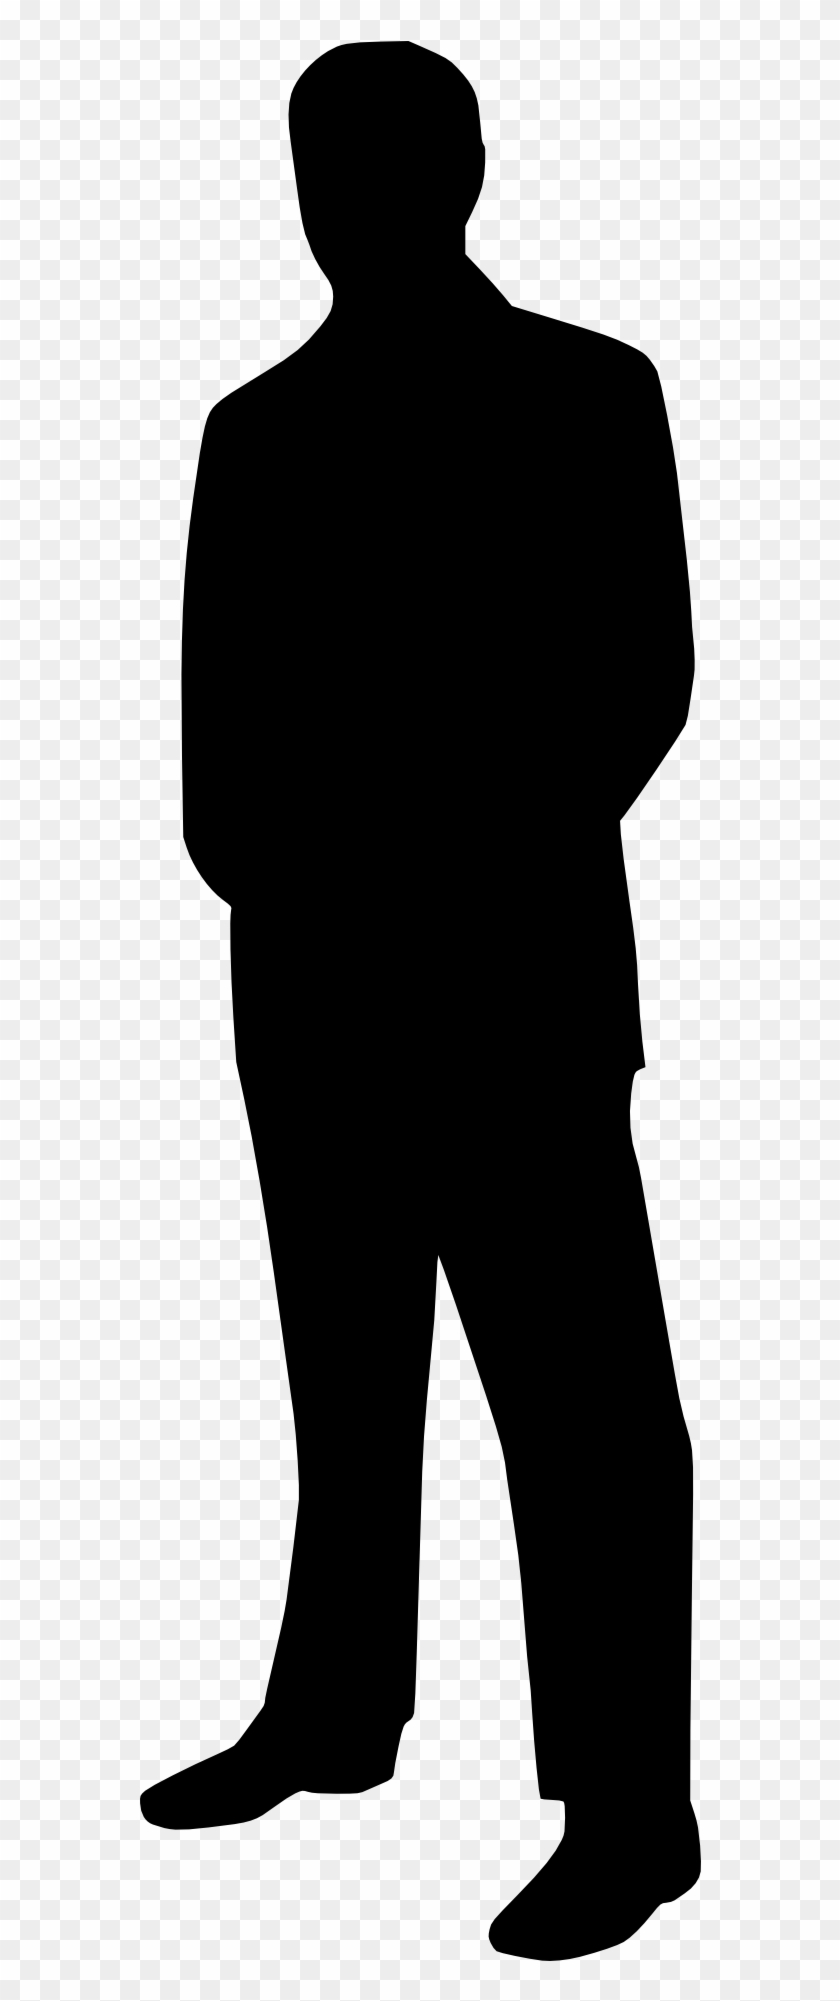 Business Man Tie Suit Black White Silhouette.